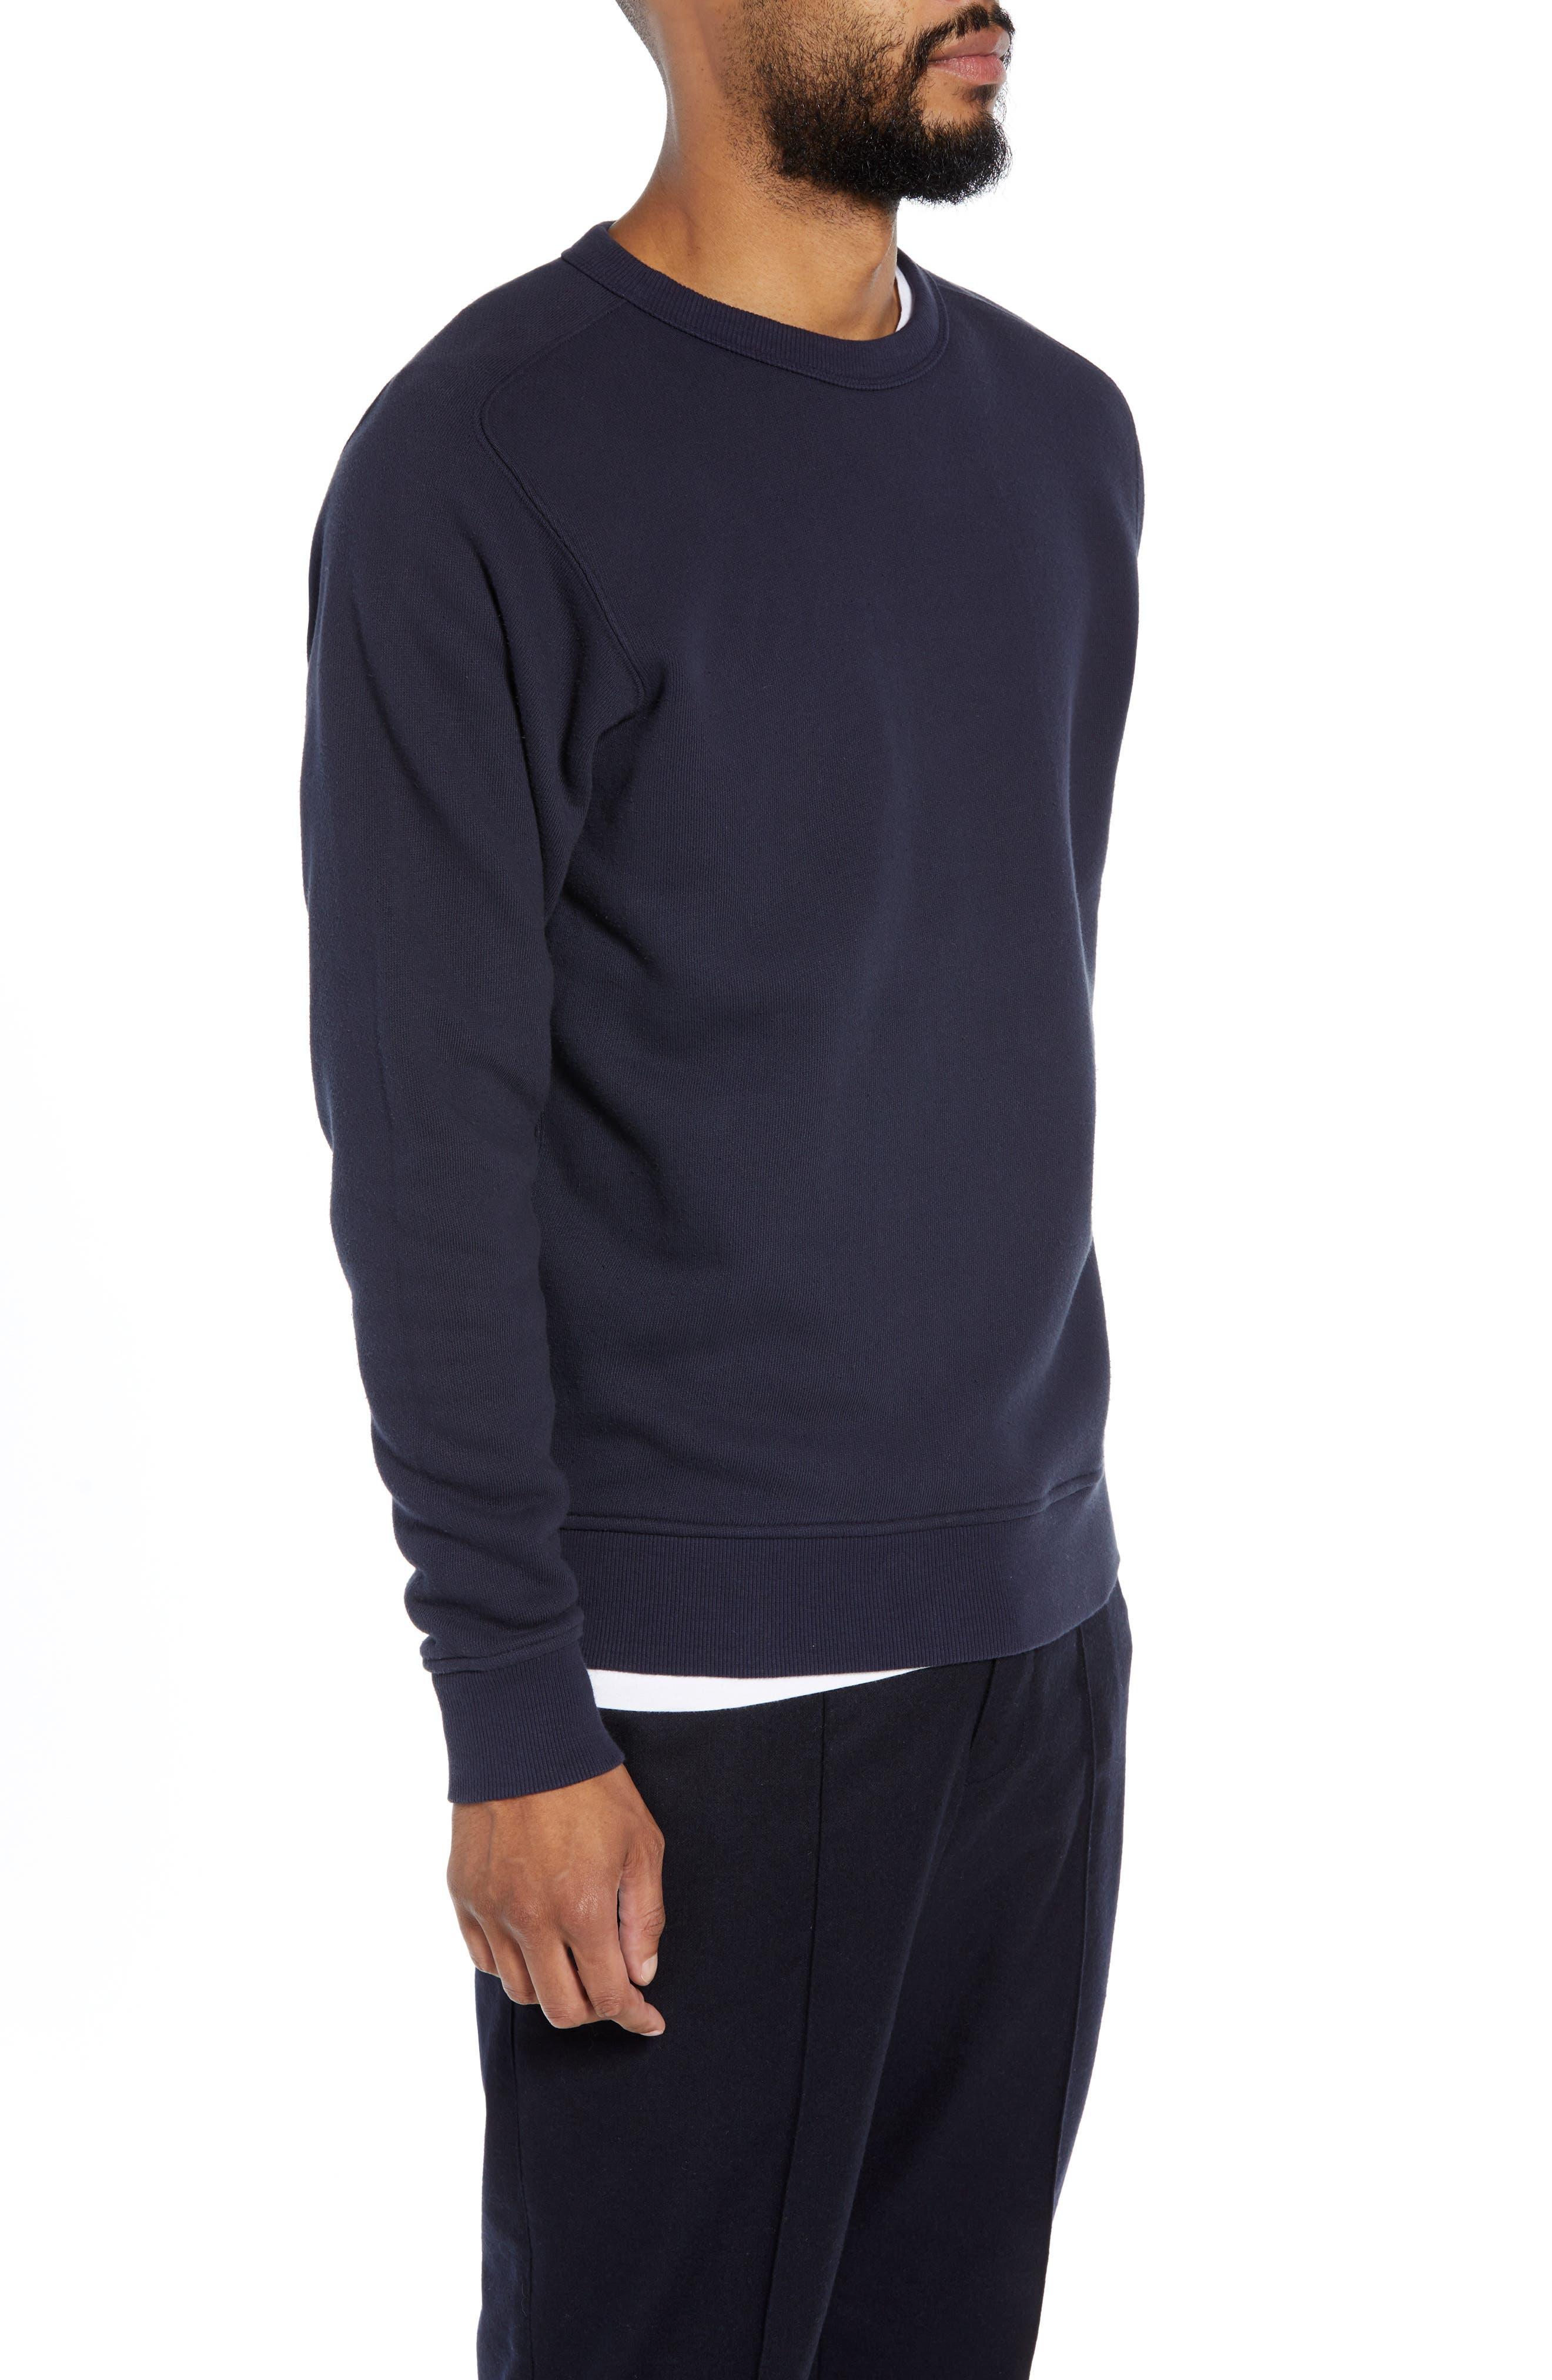 Almost Grown Crewneck Sweatshirt,                             Alternate thumbnail 3, color,                             NAVY